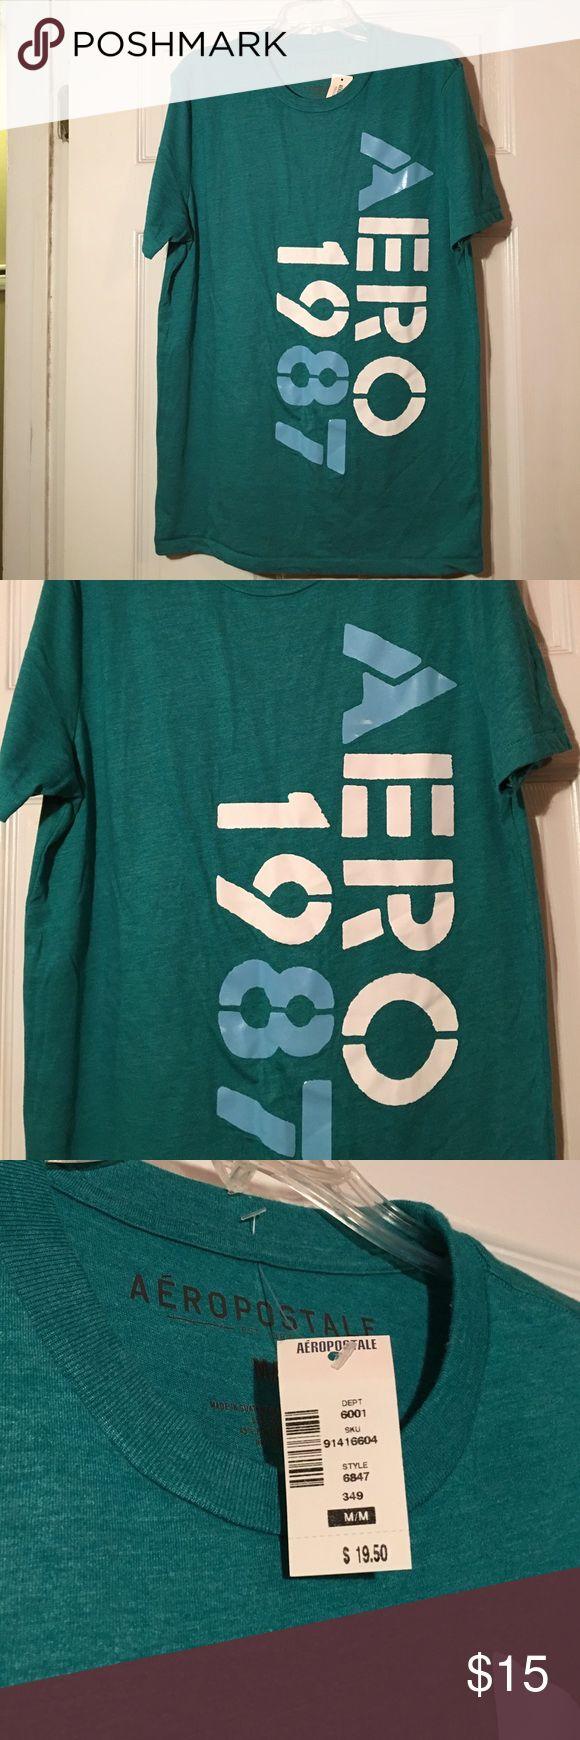 NWT Aeropostale shirt NWT Aeropostale turquoise shirt. Aeropostale Other